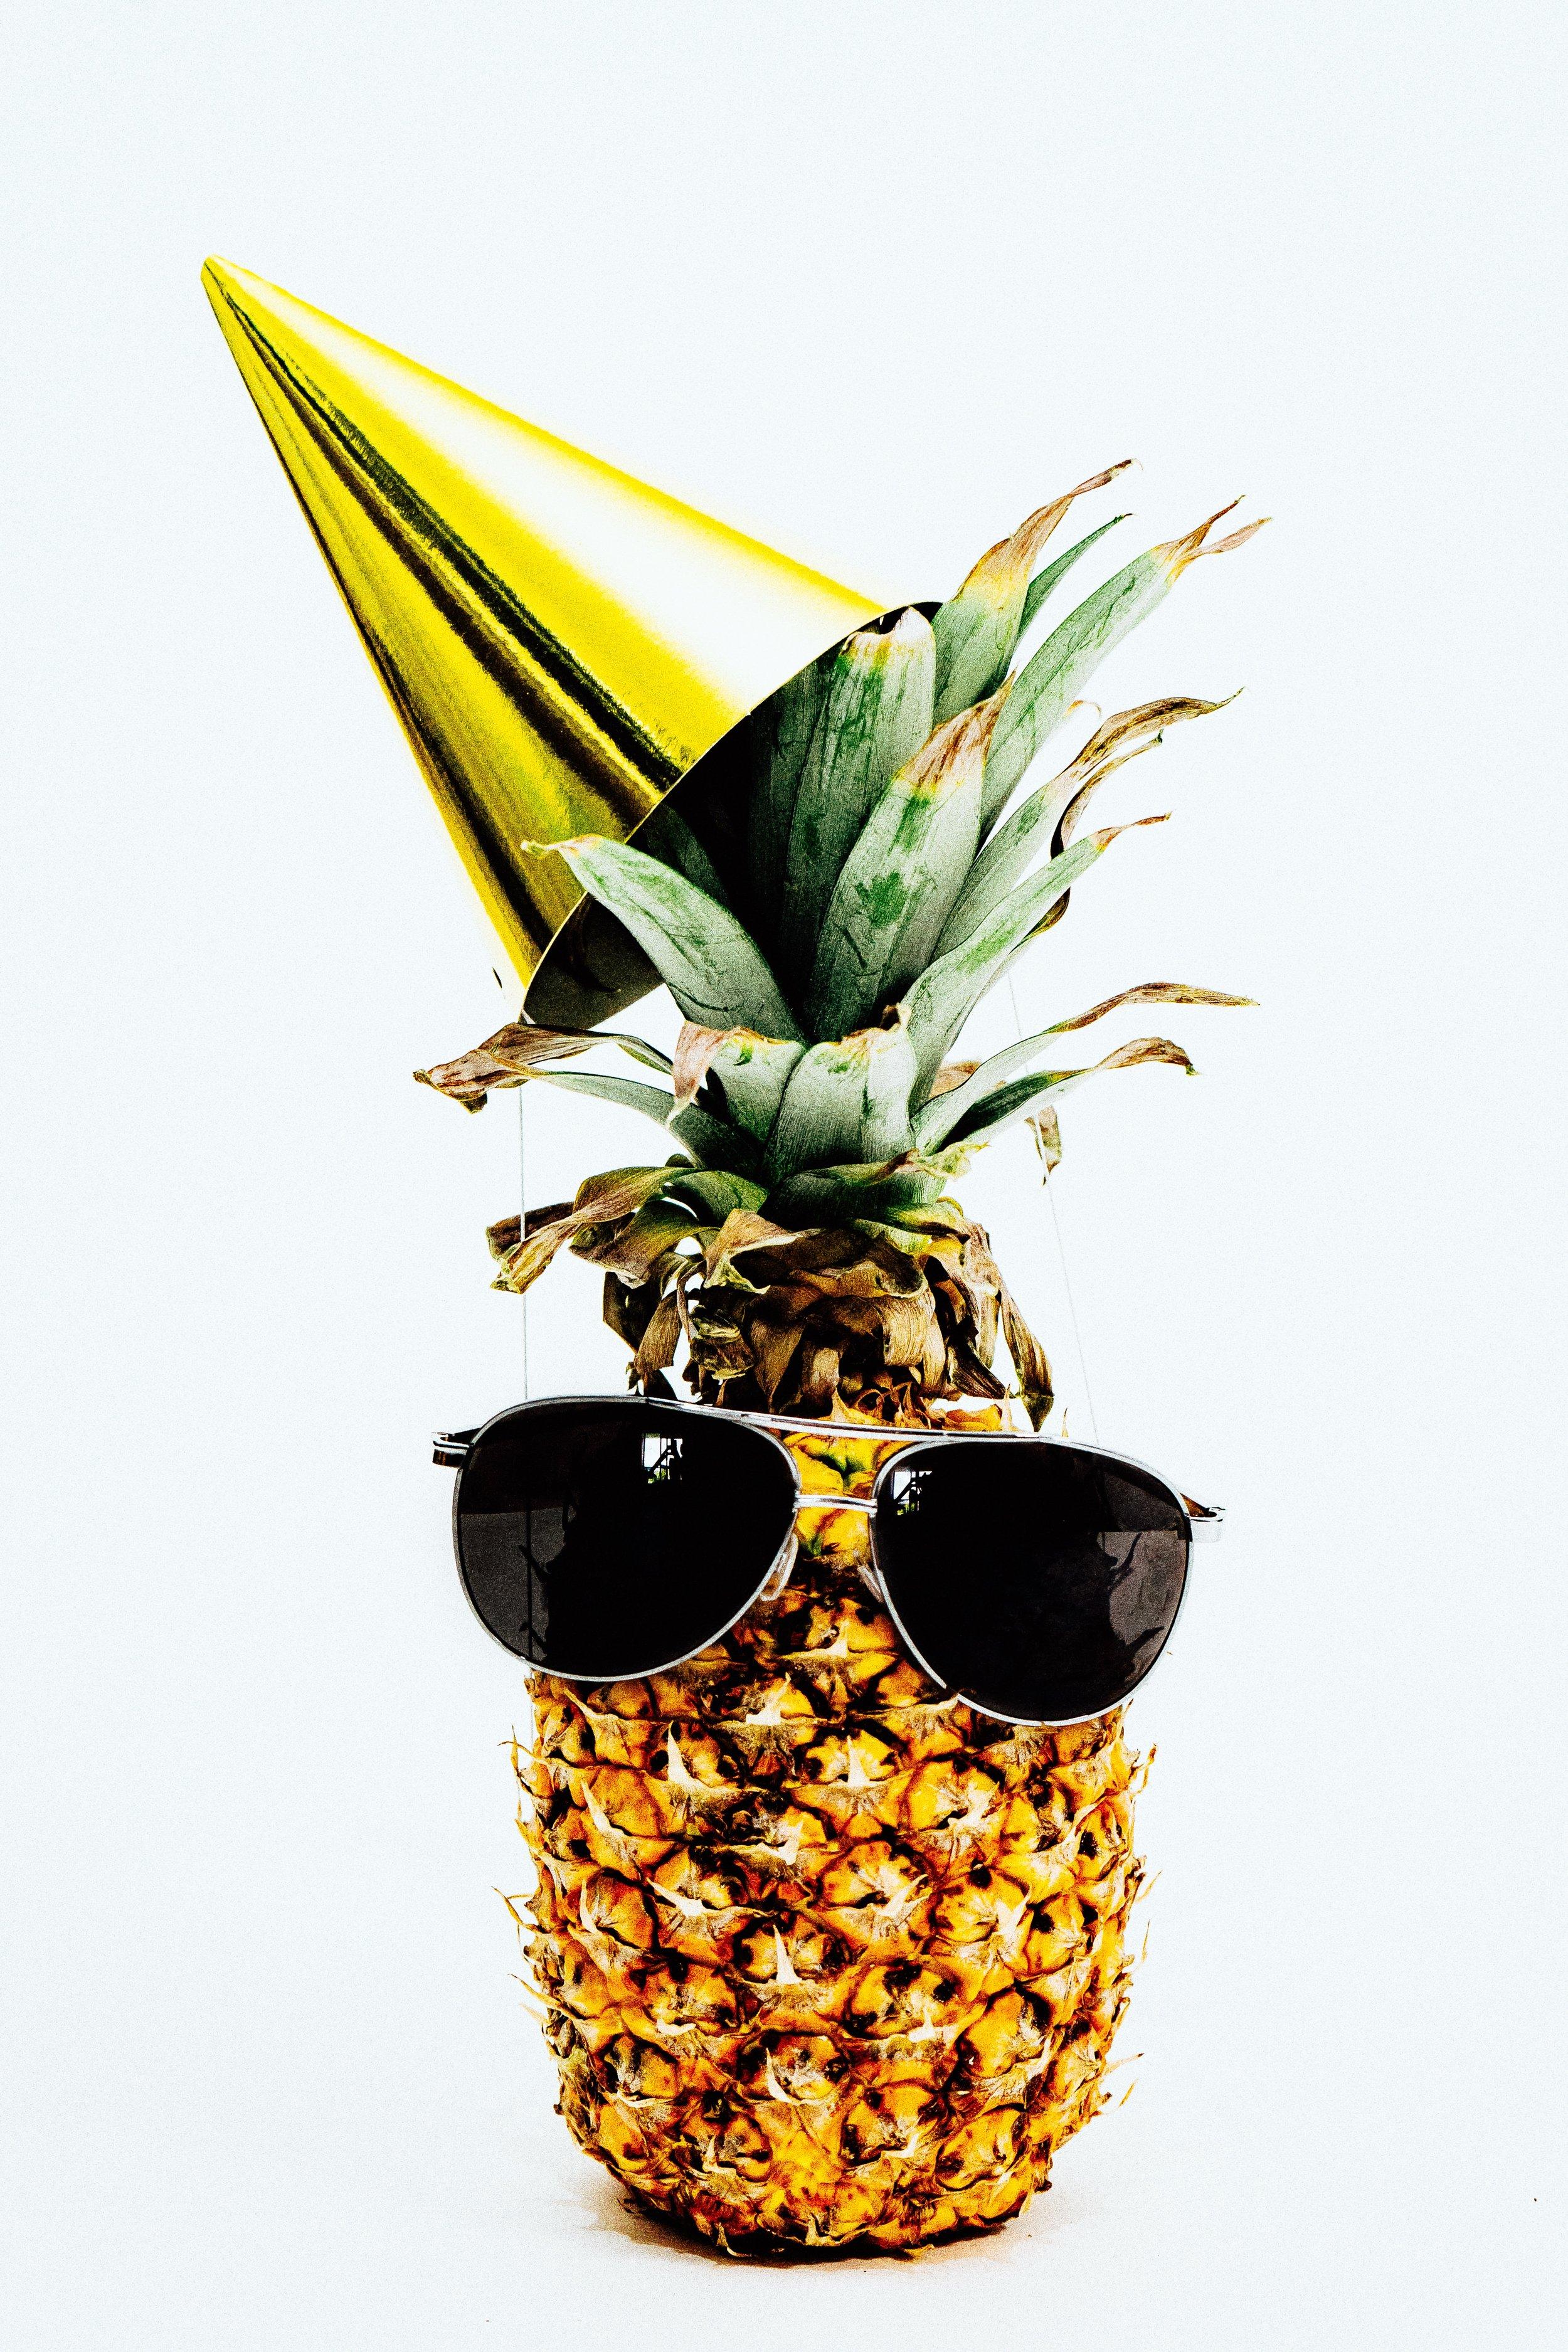 pineapple-supply-co-NgDapgpAiTE-unsplash.jpg